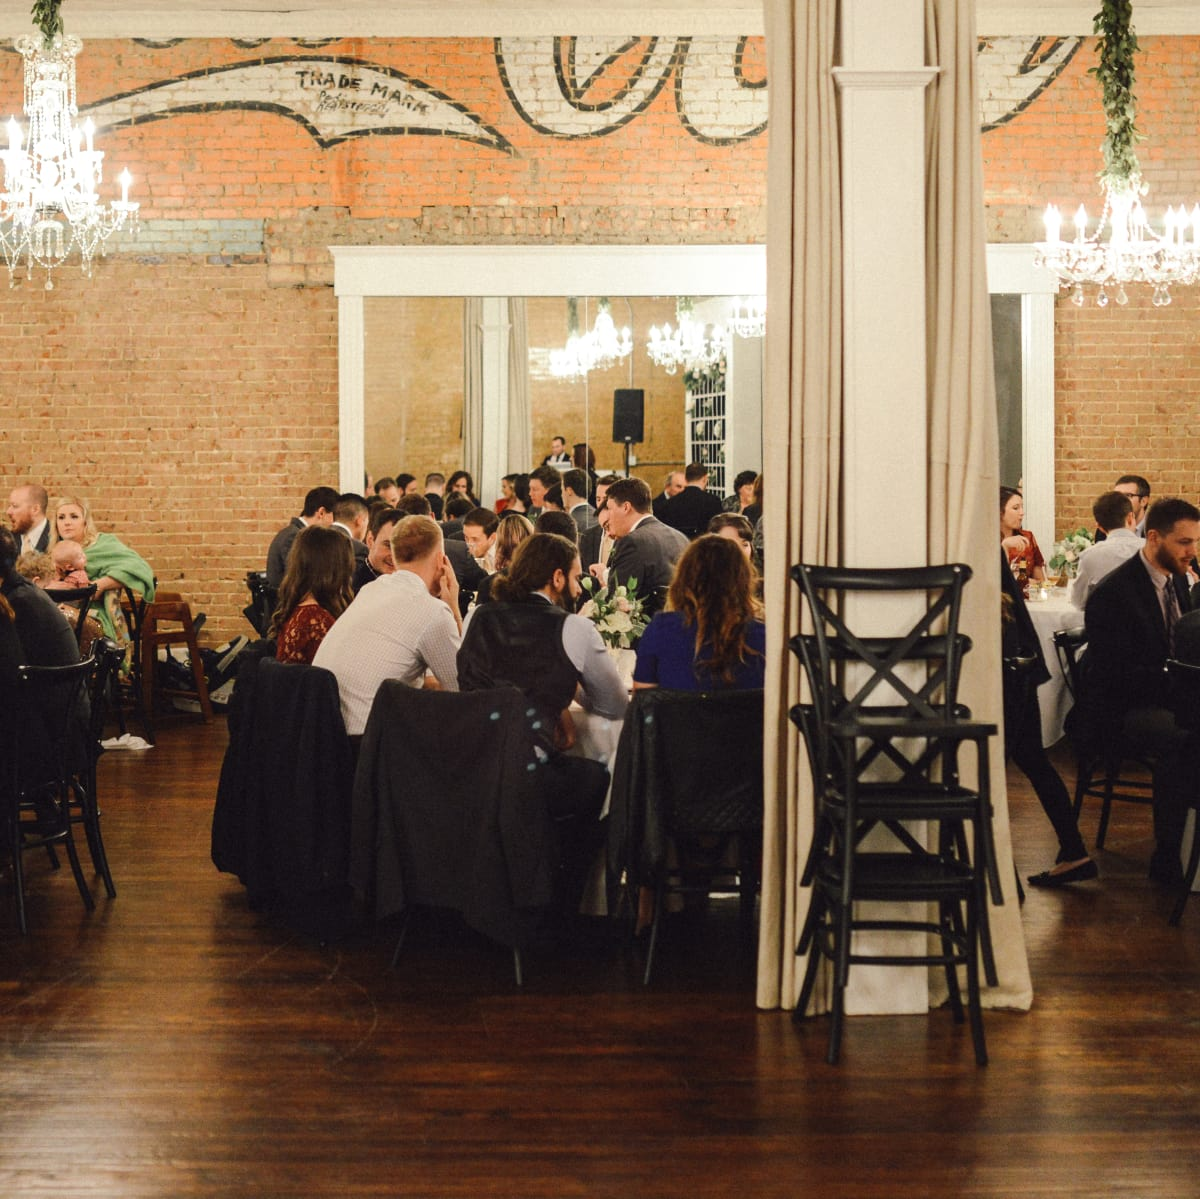 Beville wedding, venue